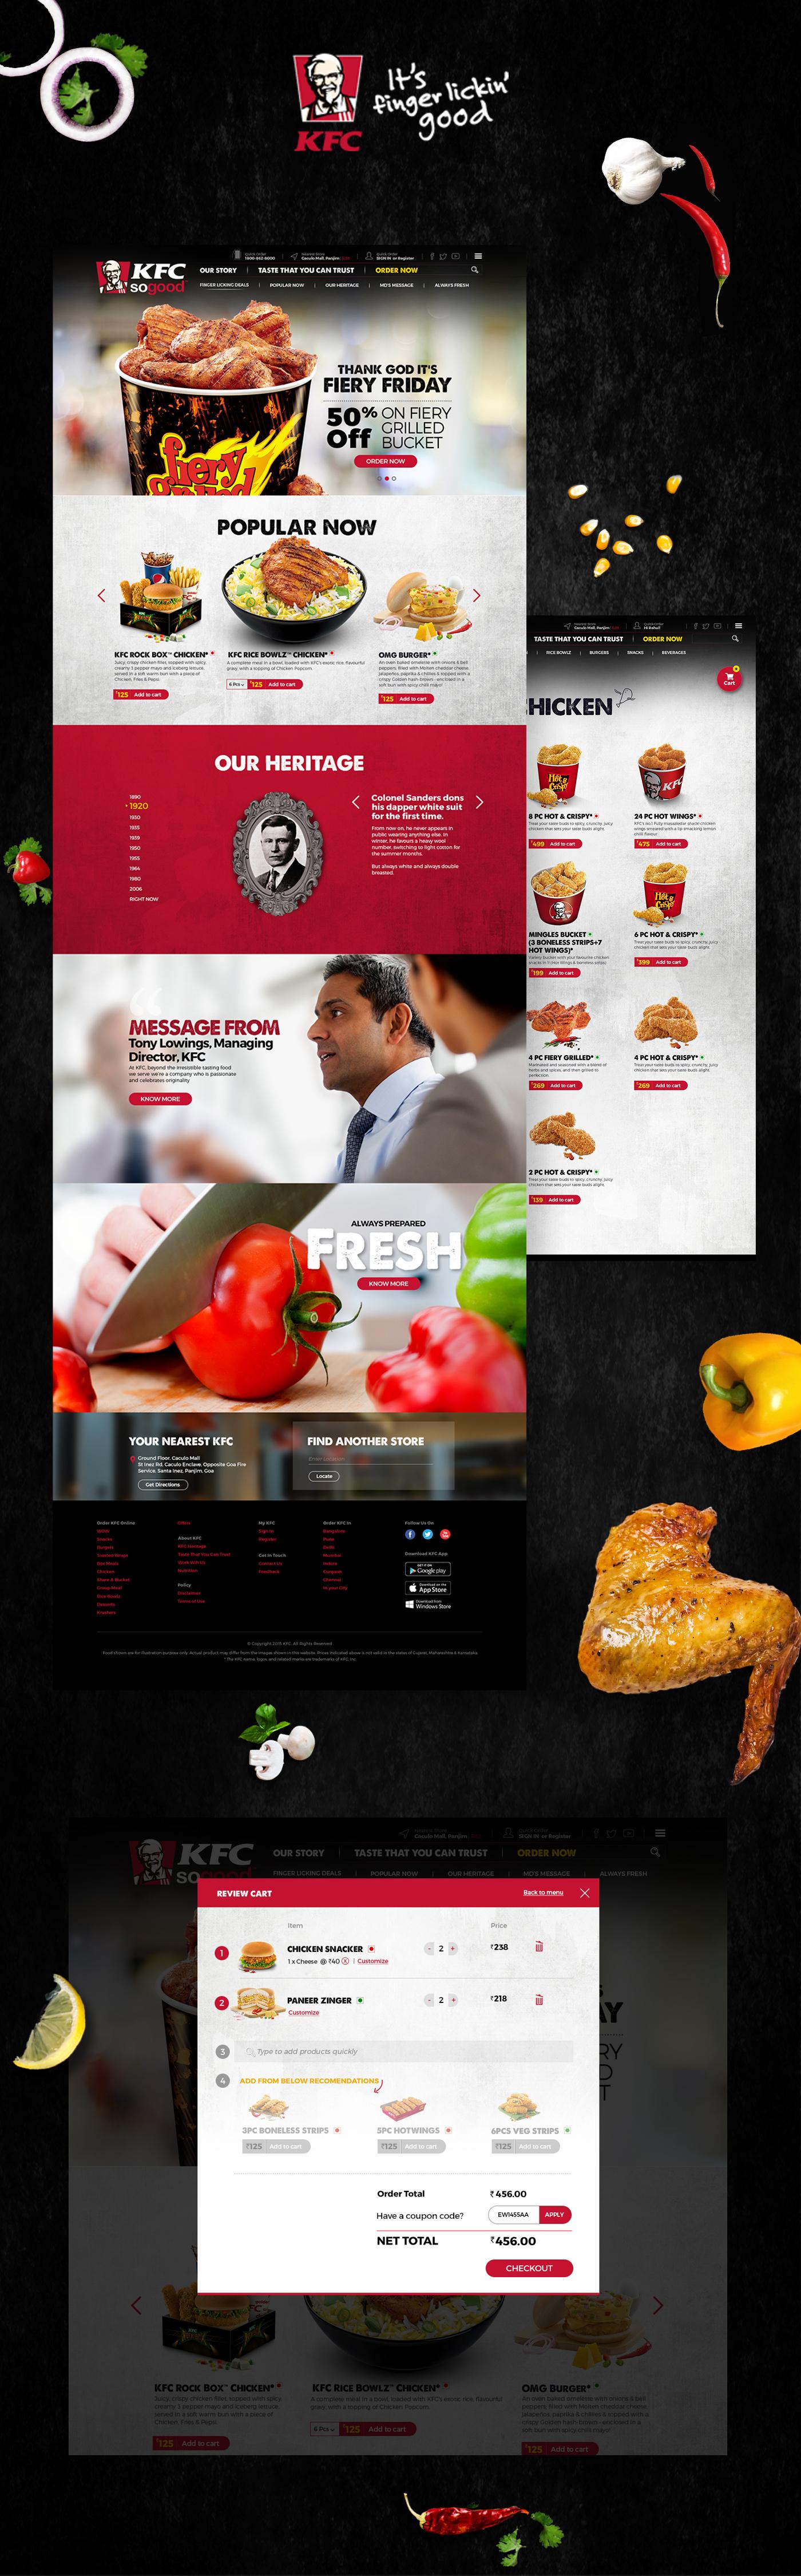 food ui KFC INDIA Food Listing UI Website UI/UX Fired Chicken chicken online food ordering KFC